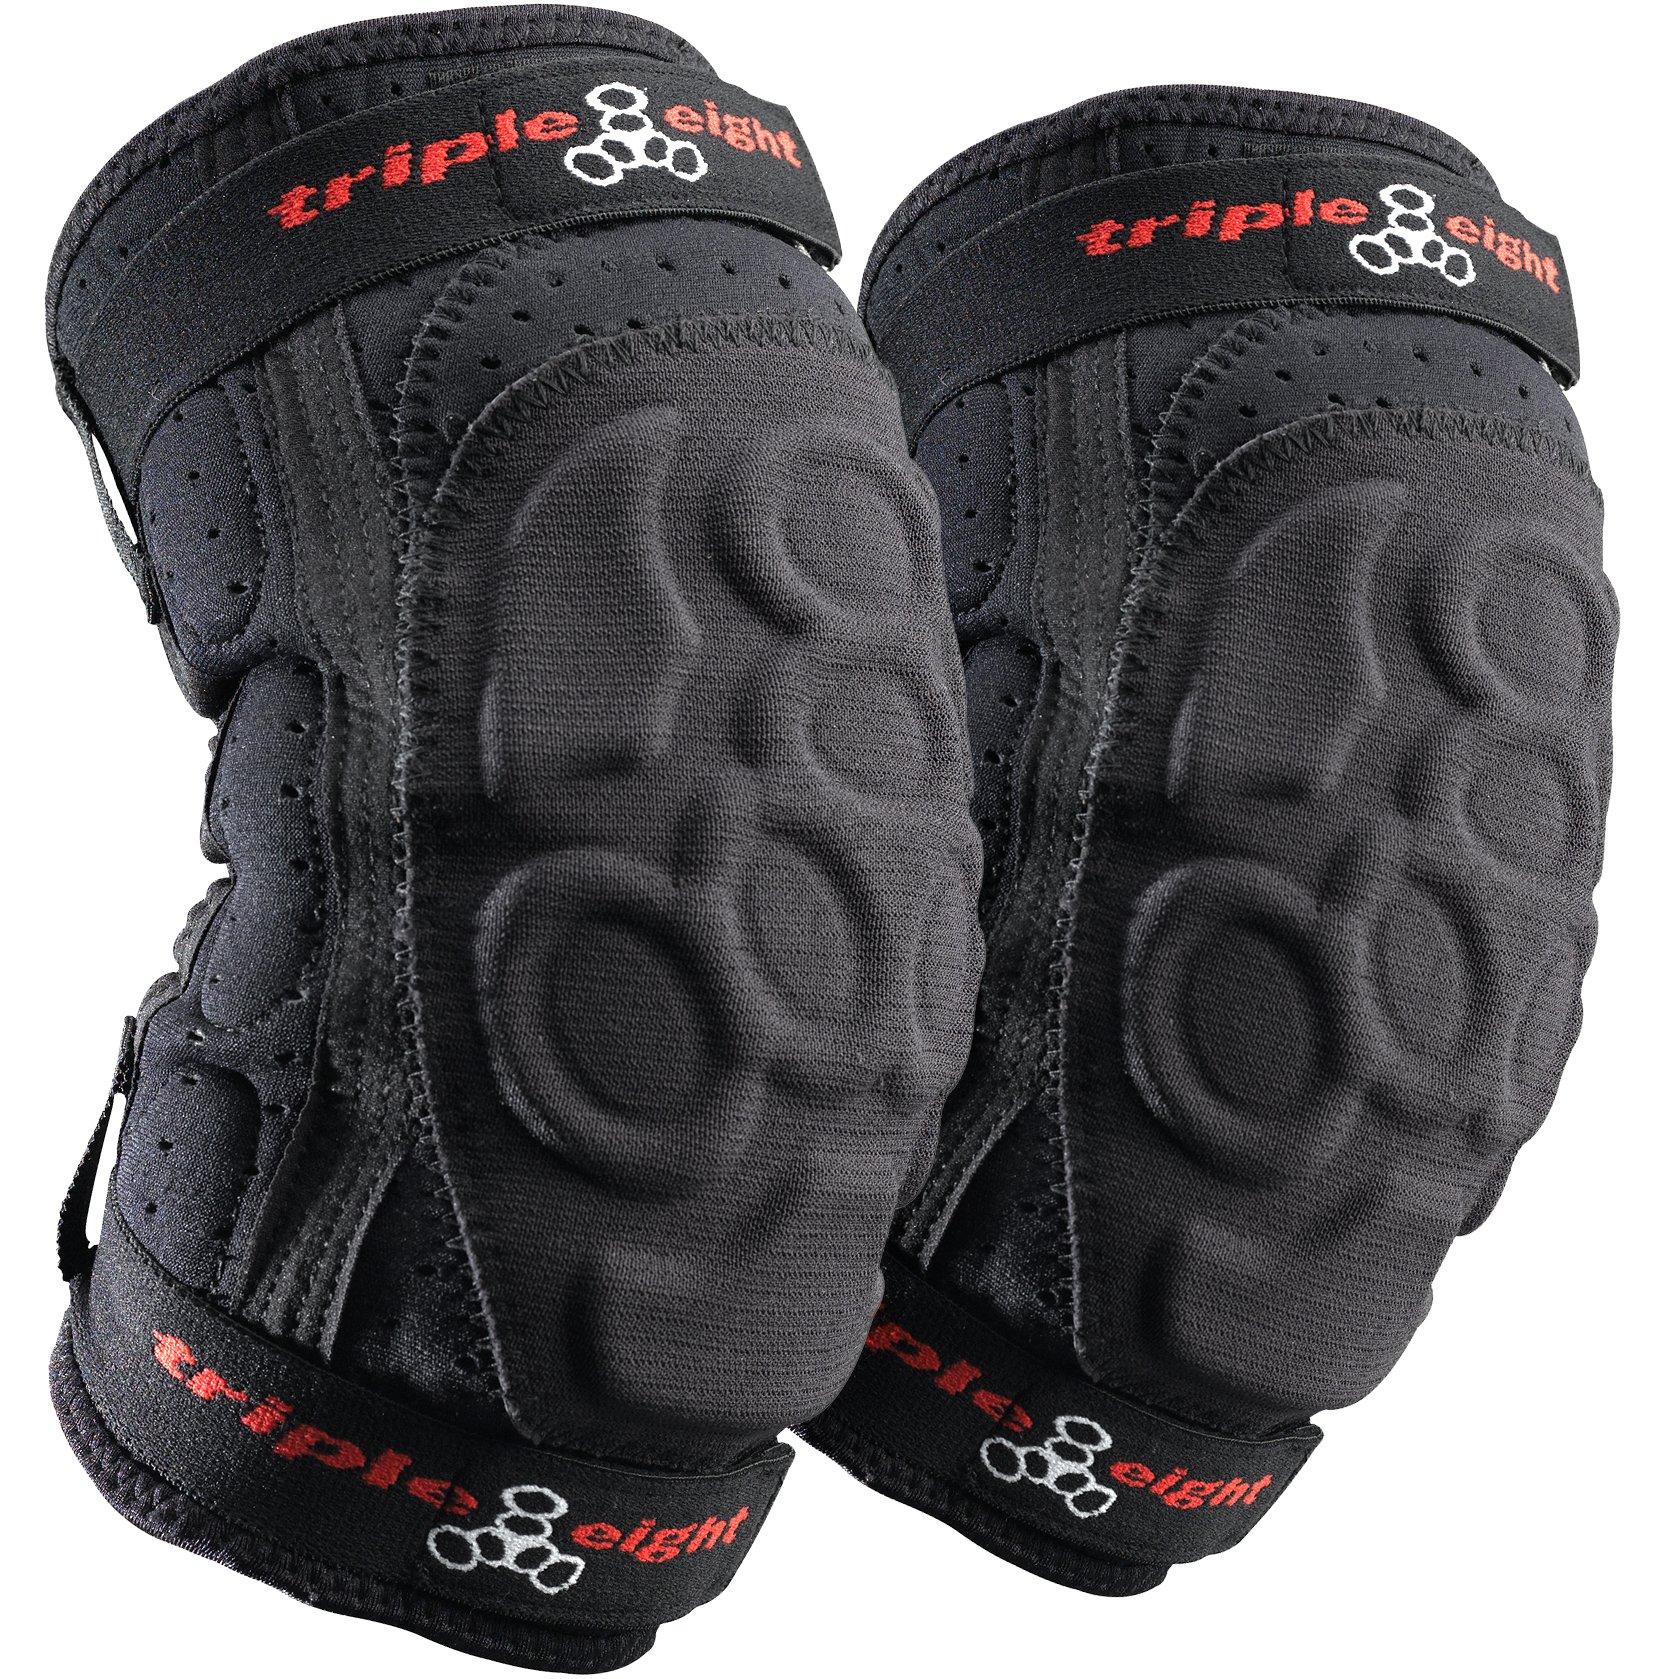 Triple Eight ExoSkin Elbow Pad (Black, Large)